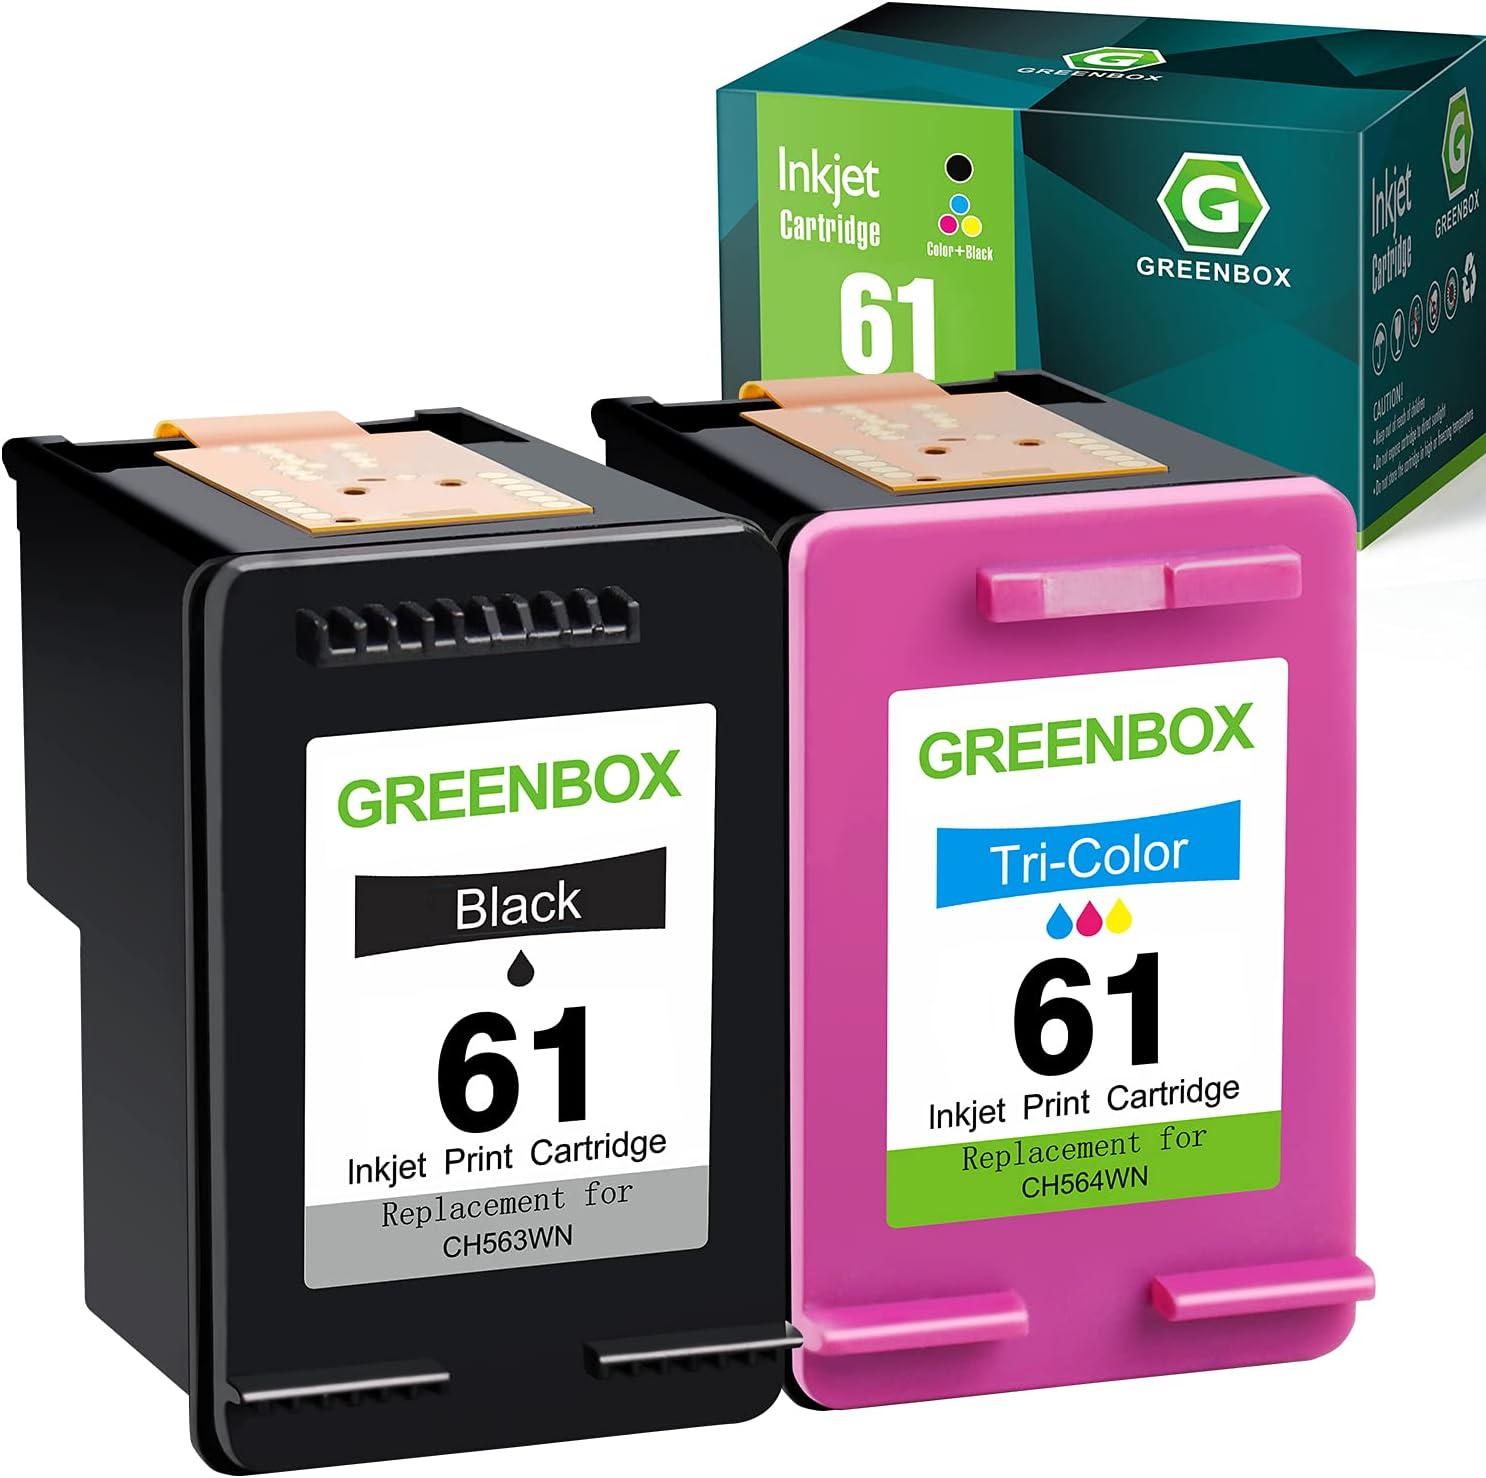 GREENBOX Remanufactured Ink Cartridge 61 Replacement for HP 61 61 for Envy 4500 5530 5535 Deskjet 1000 1056 1510 1512 1010 1055 2540 2542 3050 3510 Officejet 2620 (1 Black 1 Tri-Color)